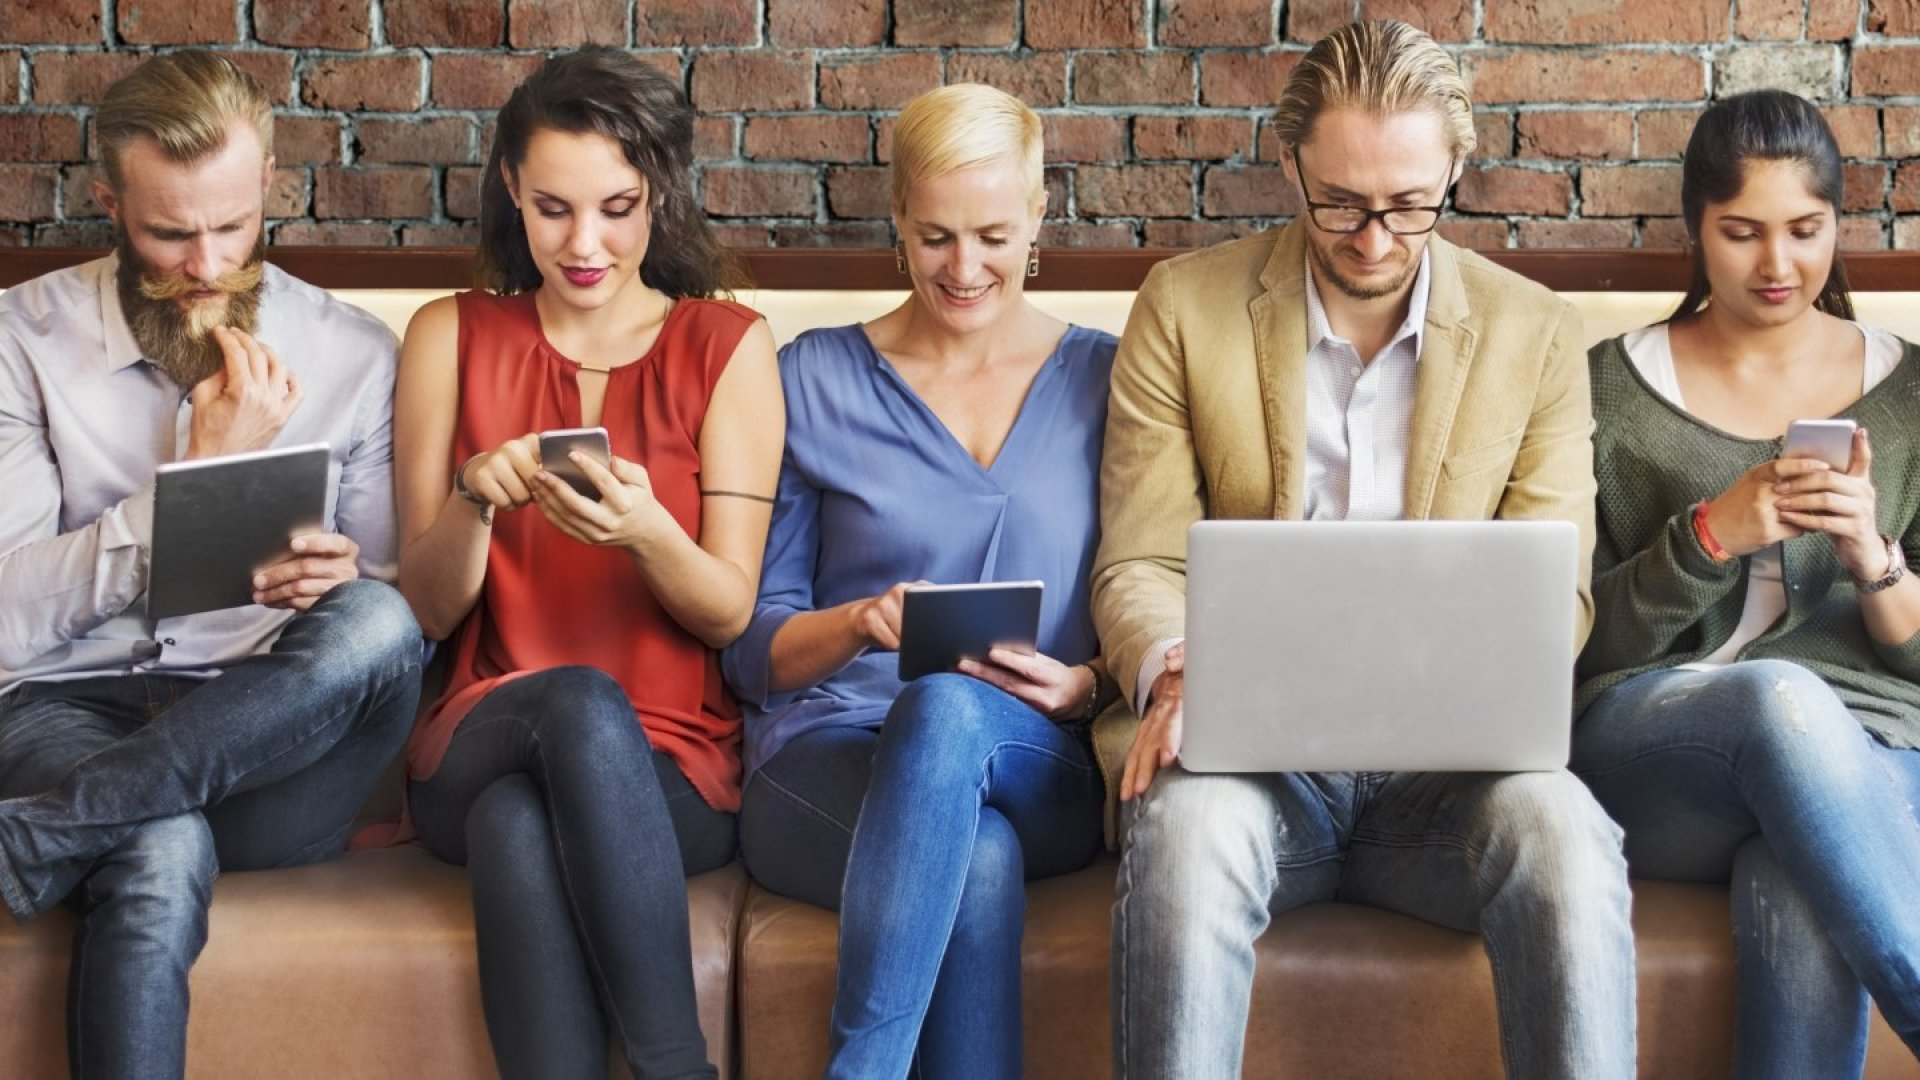 How You Can Leverage Social Media as an Entrepreneur